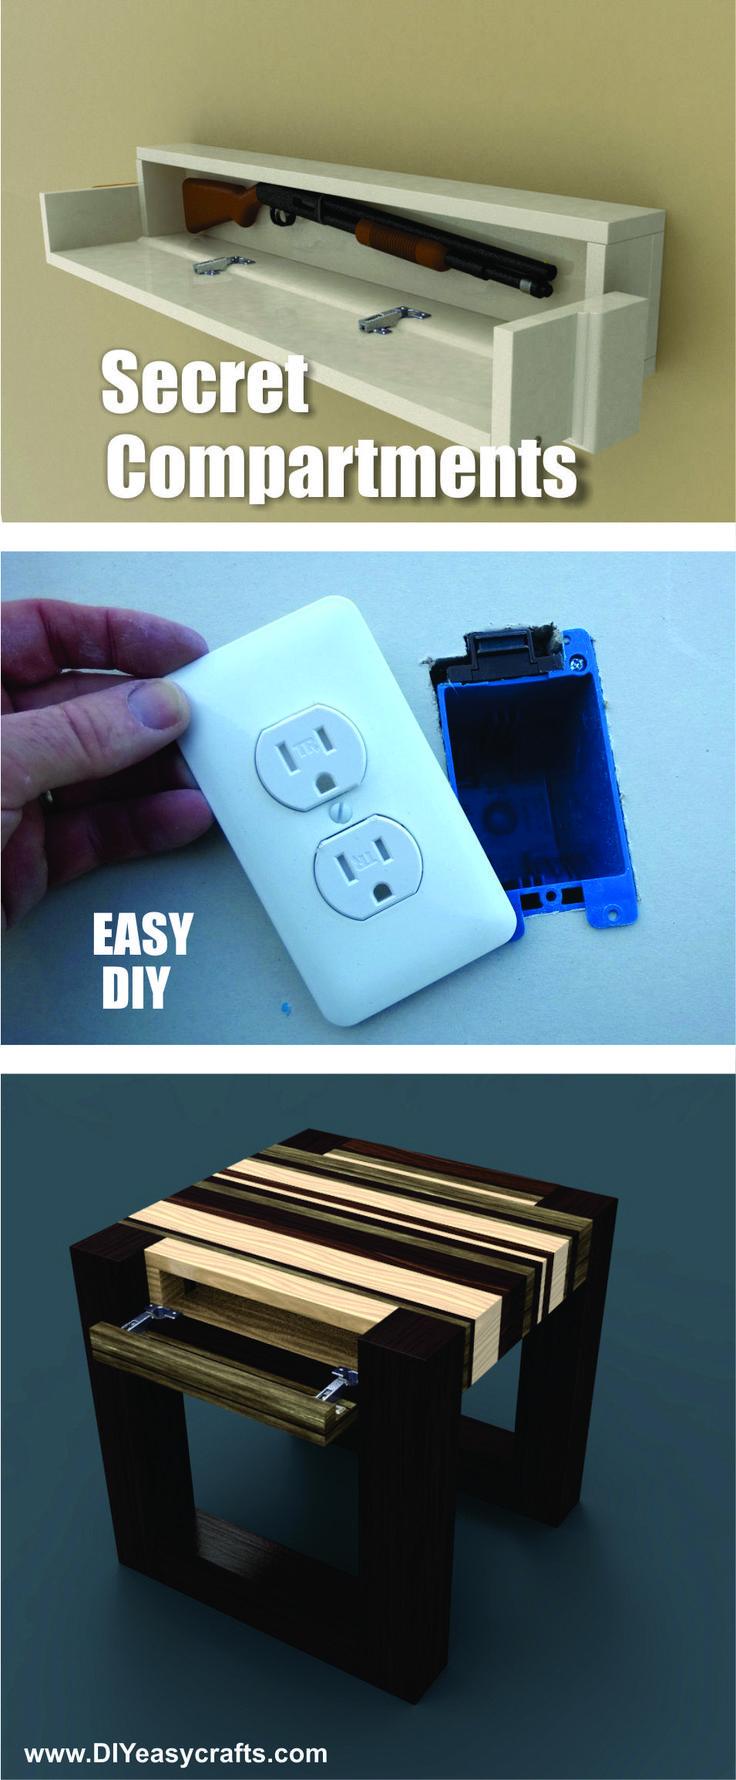 Easy DIY Secret Hidden Compartments. FREE step by step instructions. www.diyeasycrafts.com/hidden-spaces.html